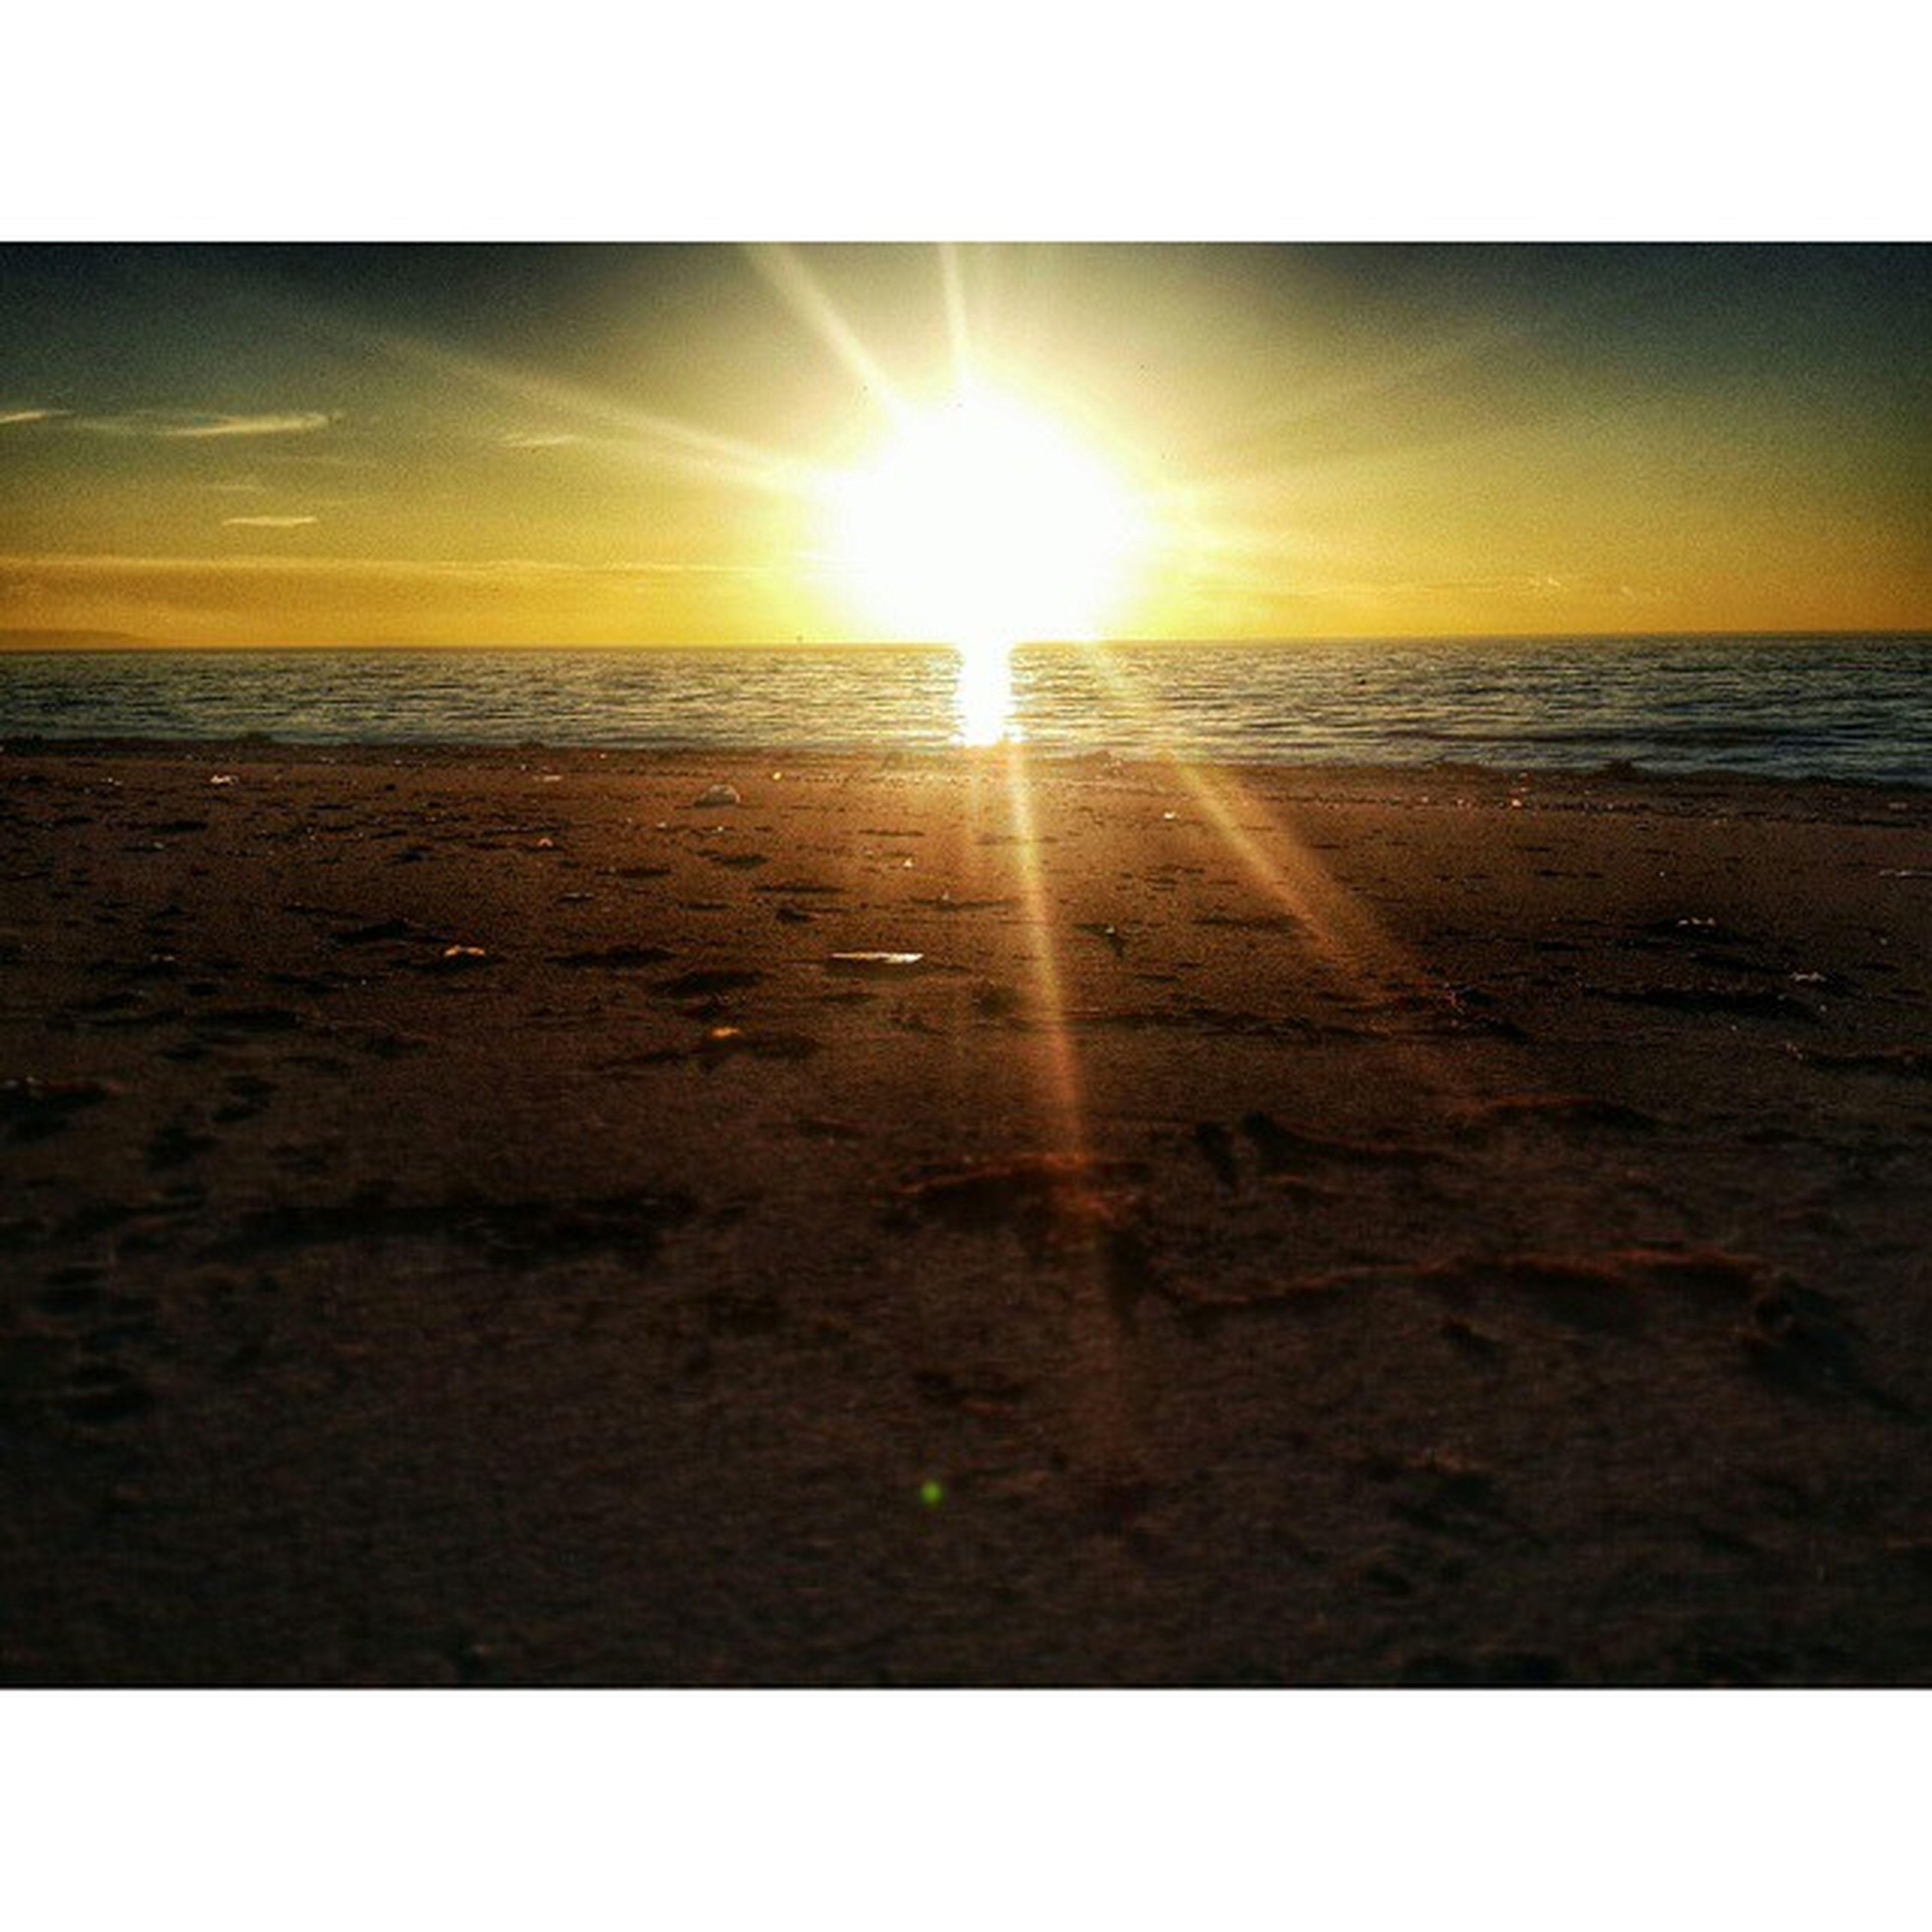 sun, beach, sunset, sea, horizon over water, sand, tranquil scene, shore, transfer print, tranquility, scenics, water, sunlight, beauty in nature, sky, auto post production filter, nature, sunbeam, idyllic, lens flare